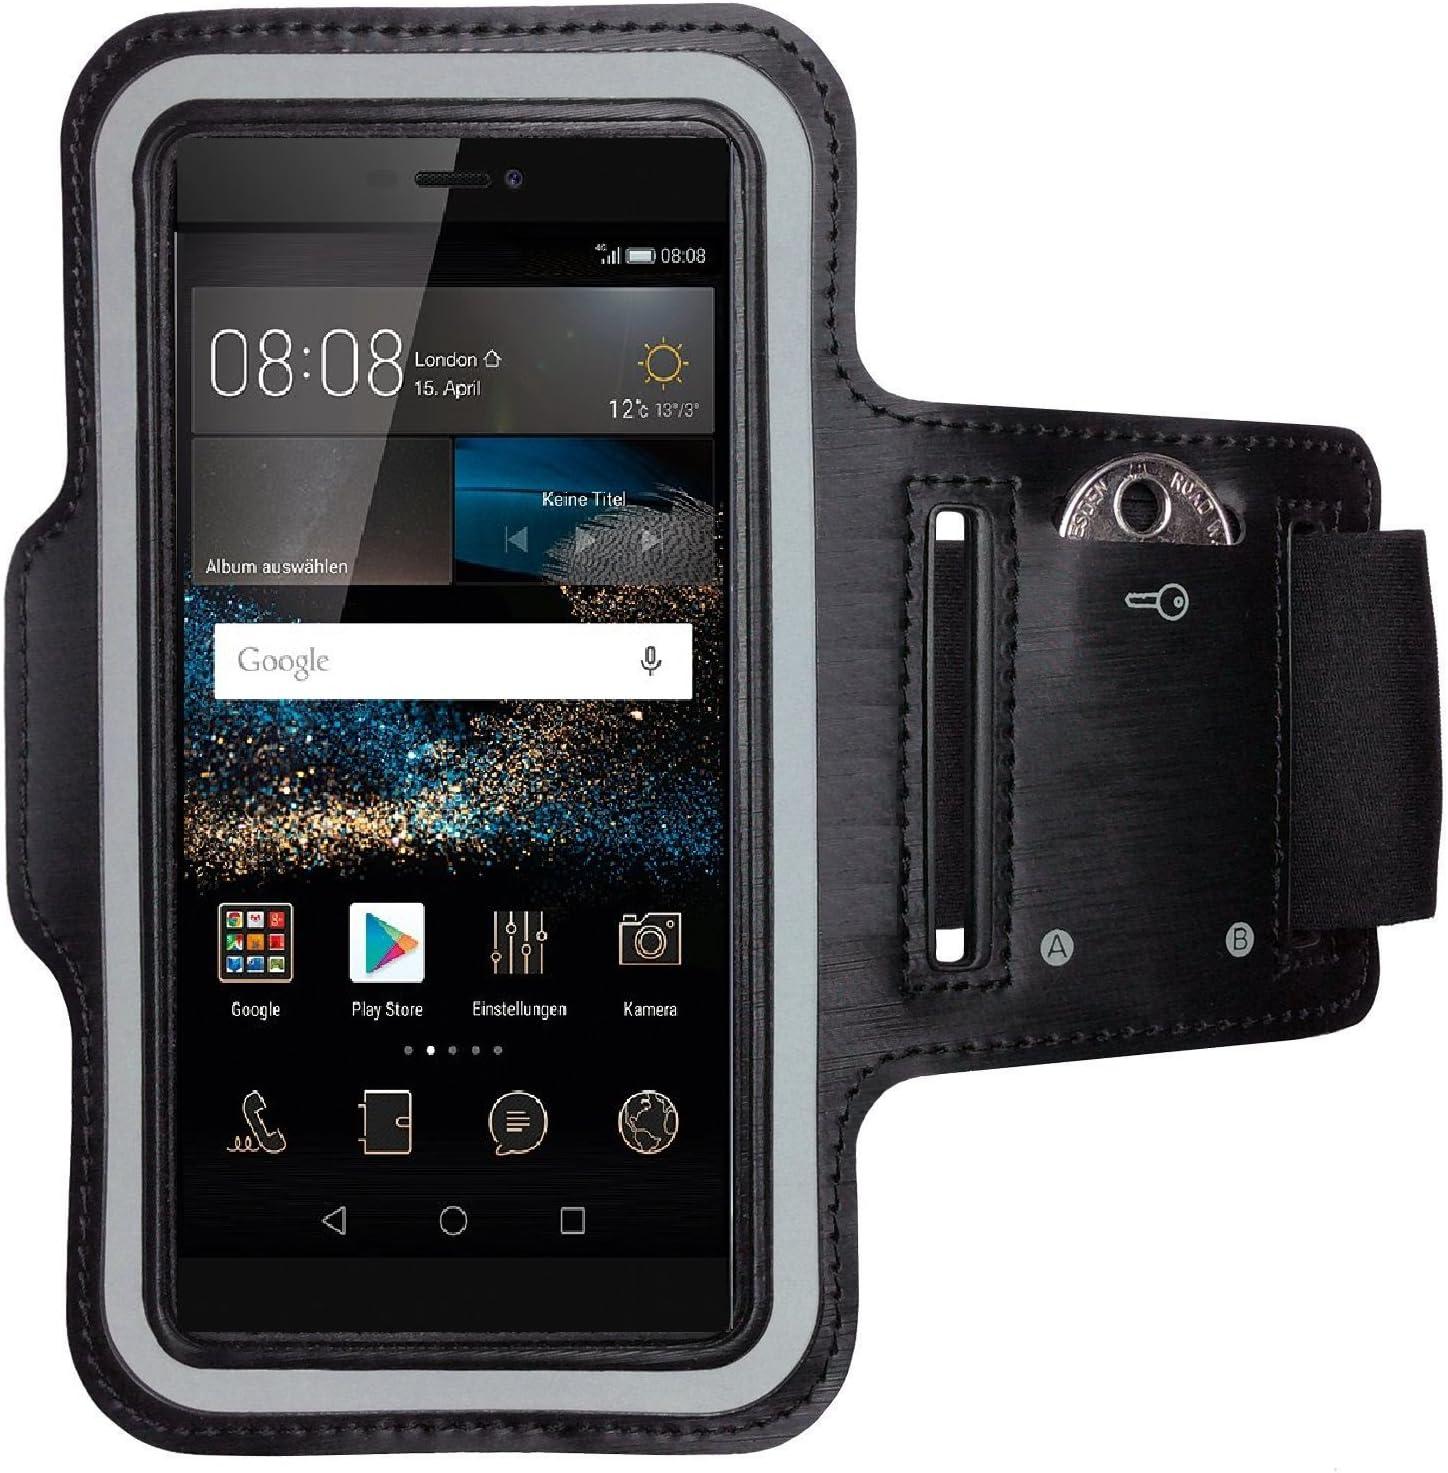 Coverkingz Sportarmband Für Huawei P8 Armtasche Mit Elektronik